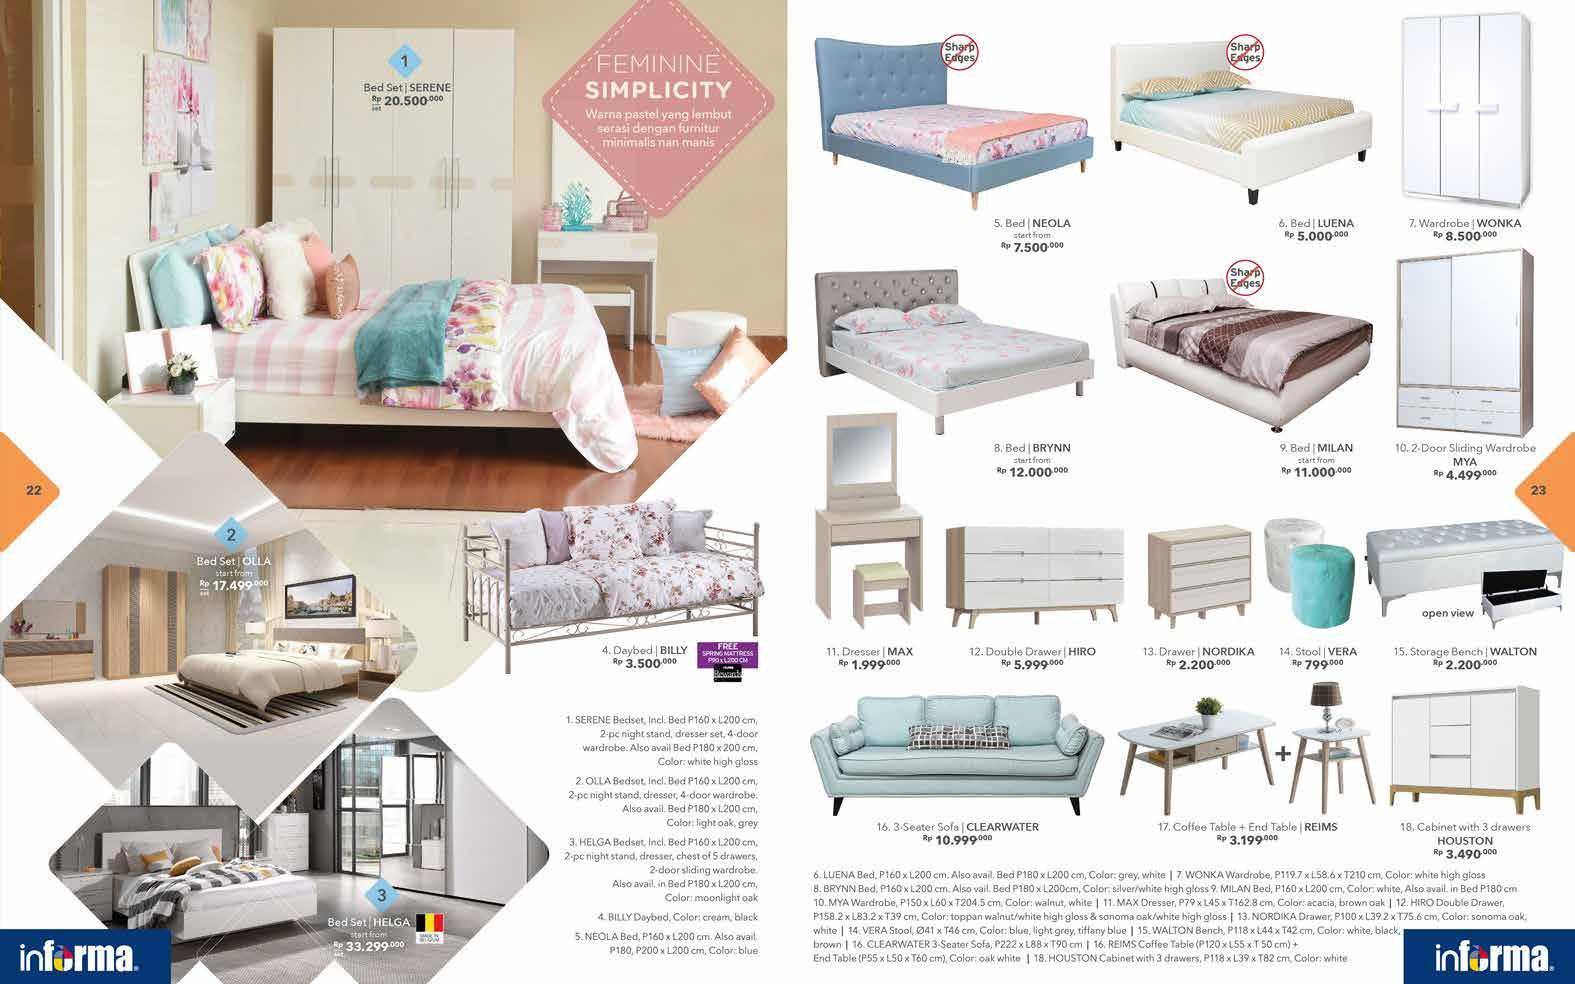 Sofa Informa Katalog Taraba Home Review Voucher Rma Type To Search Item In This Catalogue